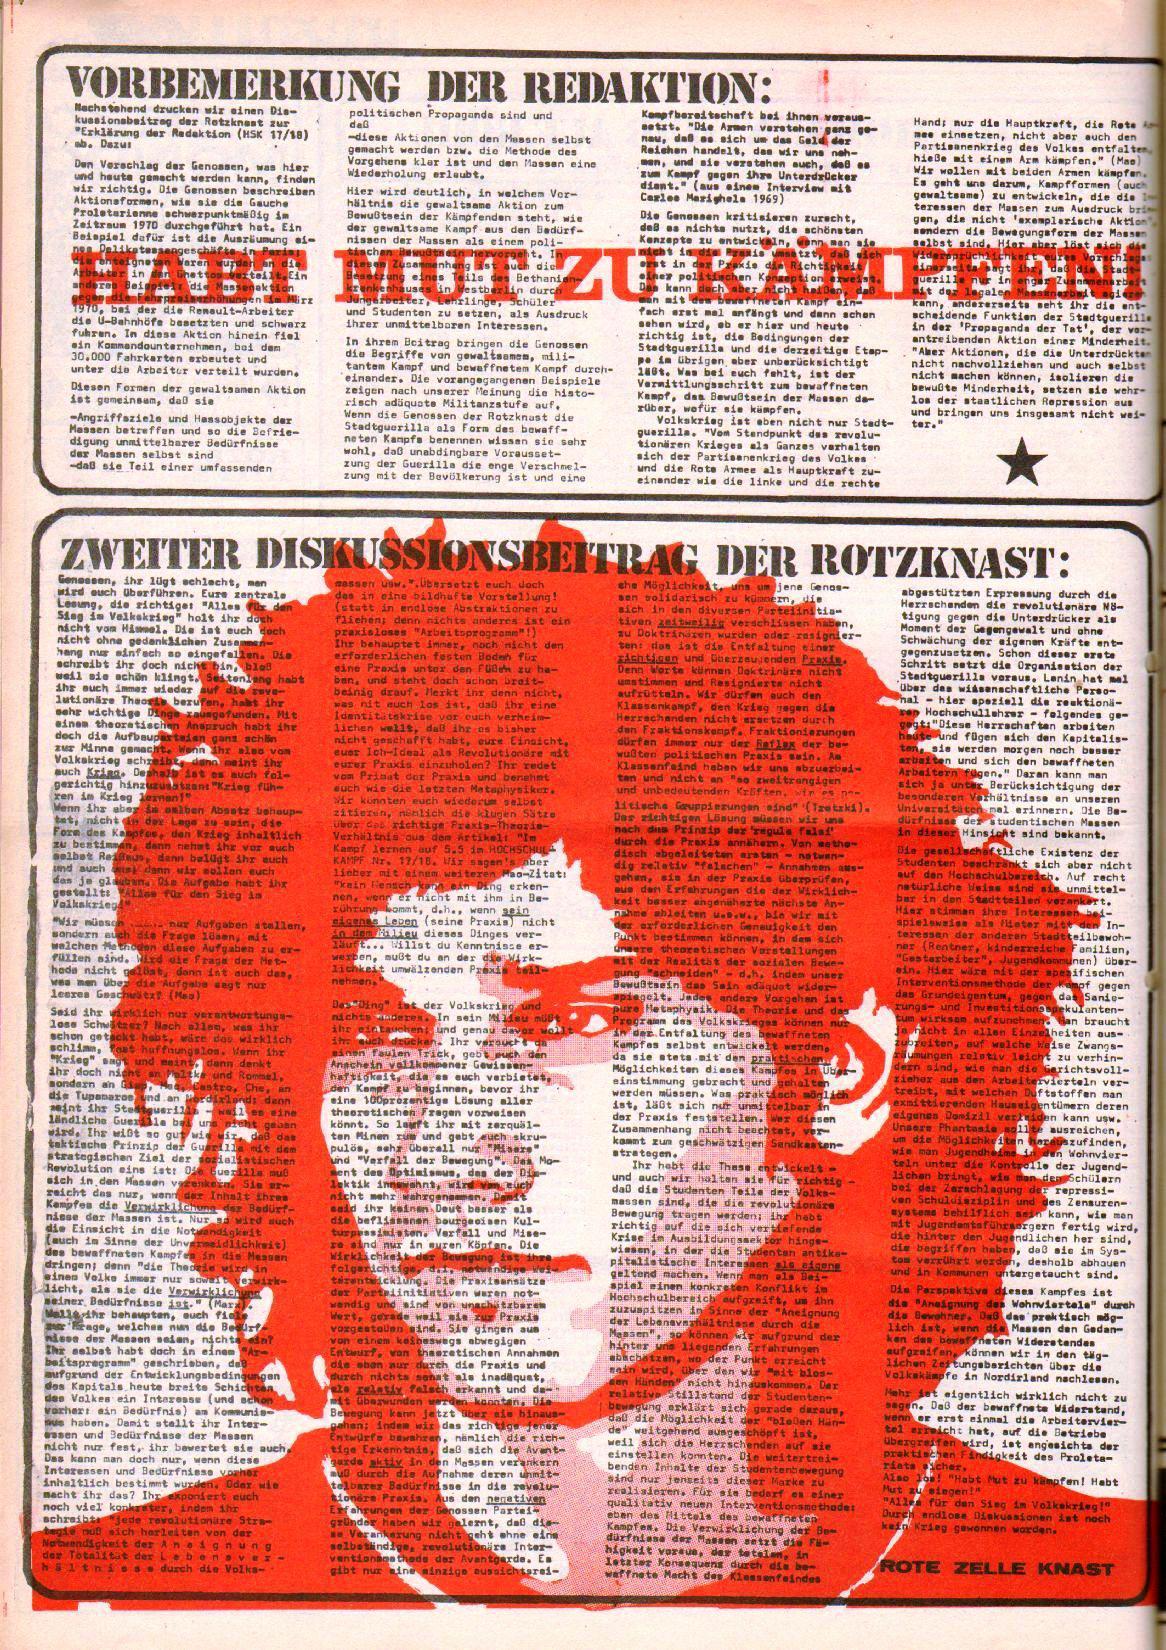 Berlin_Hochschulkampf_1971_22_12